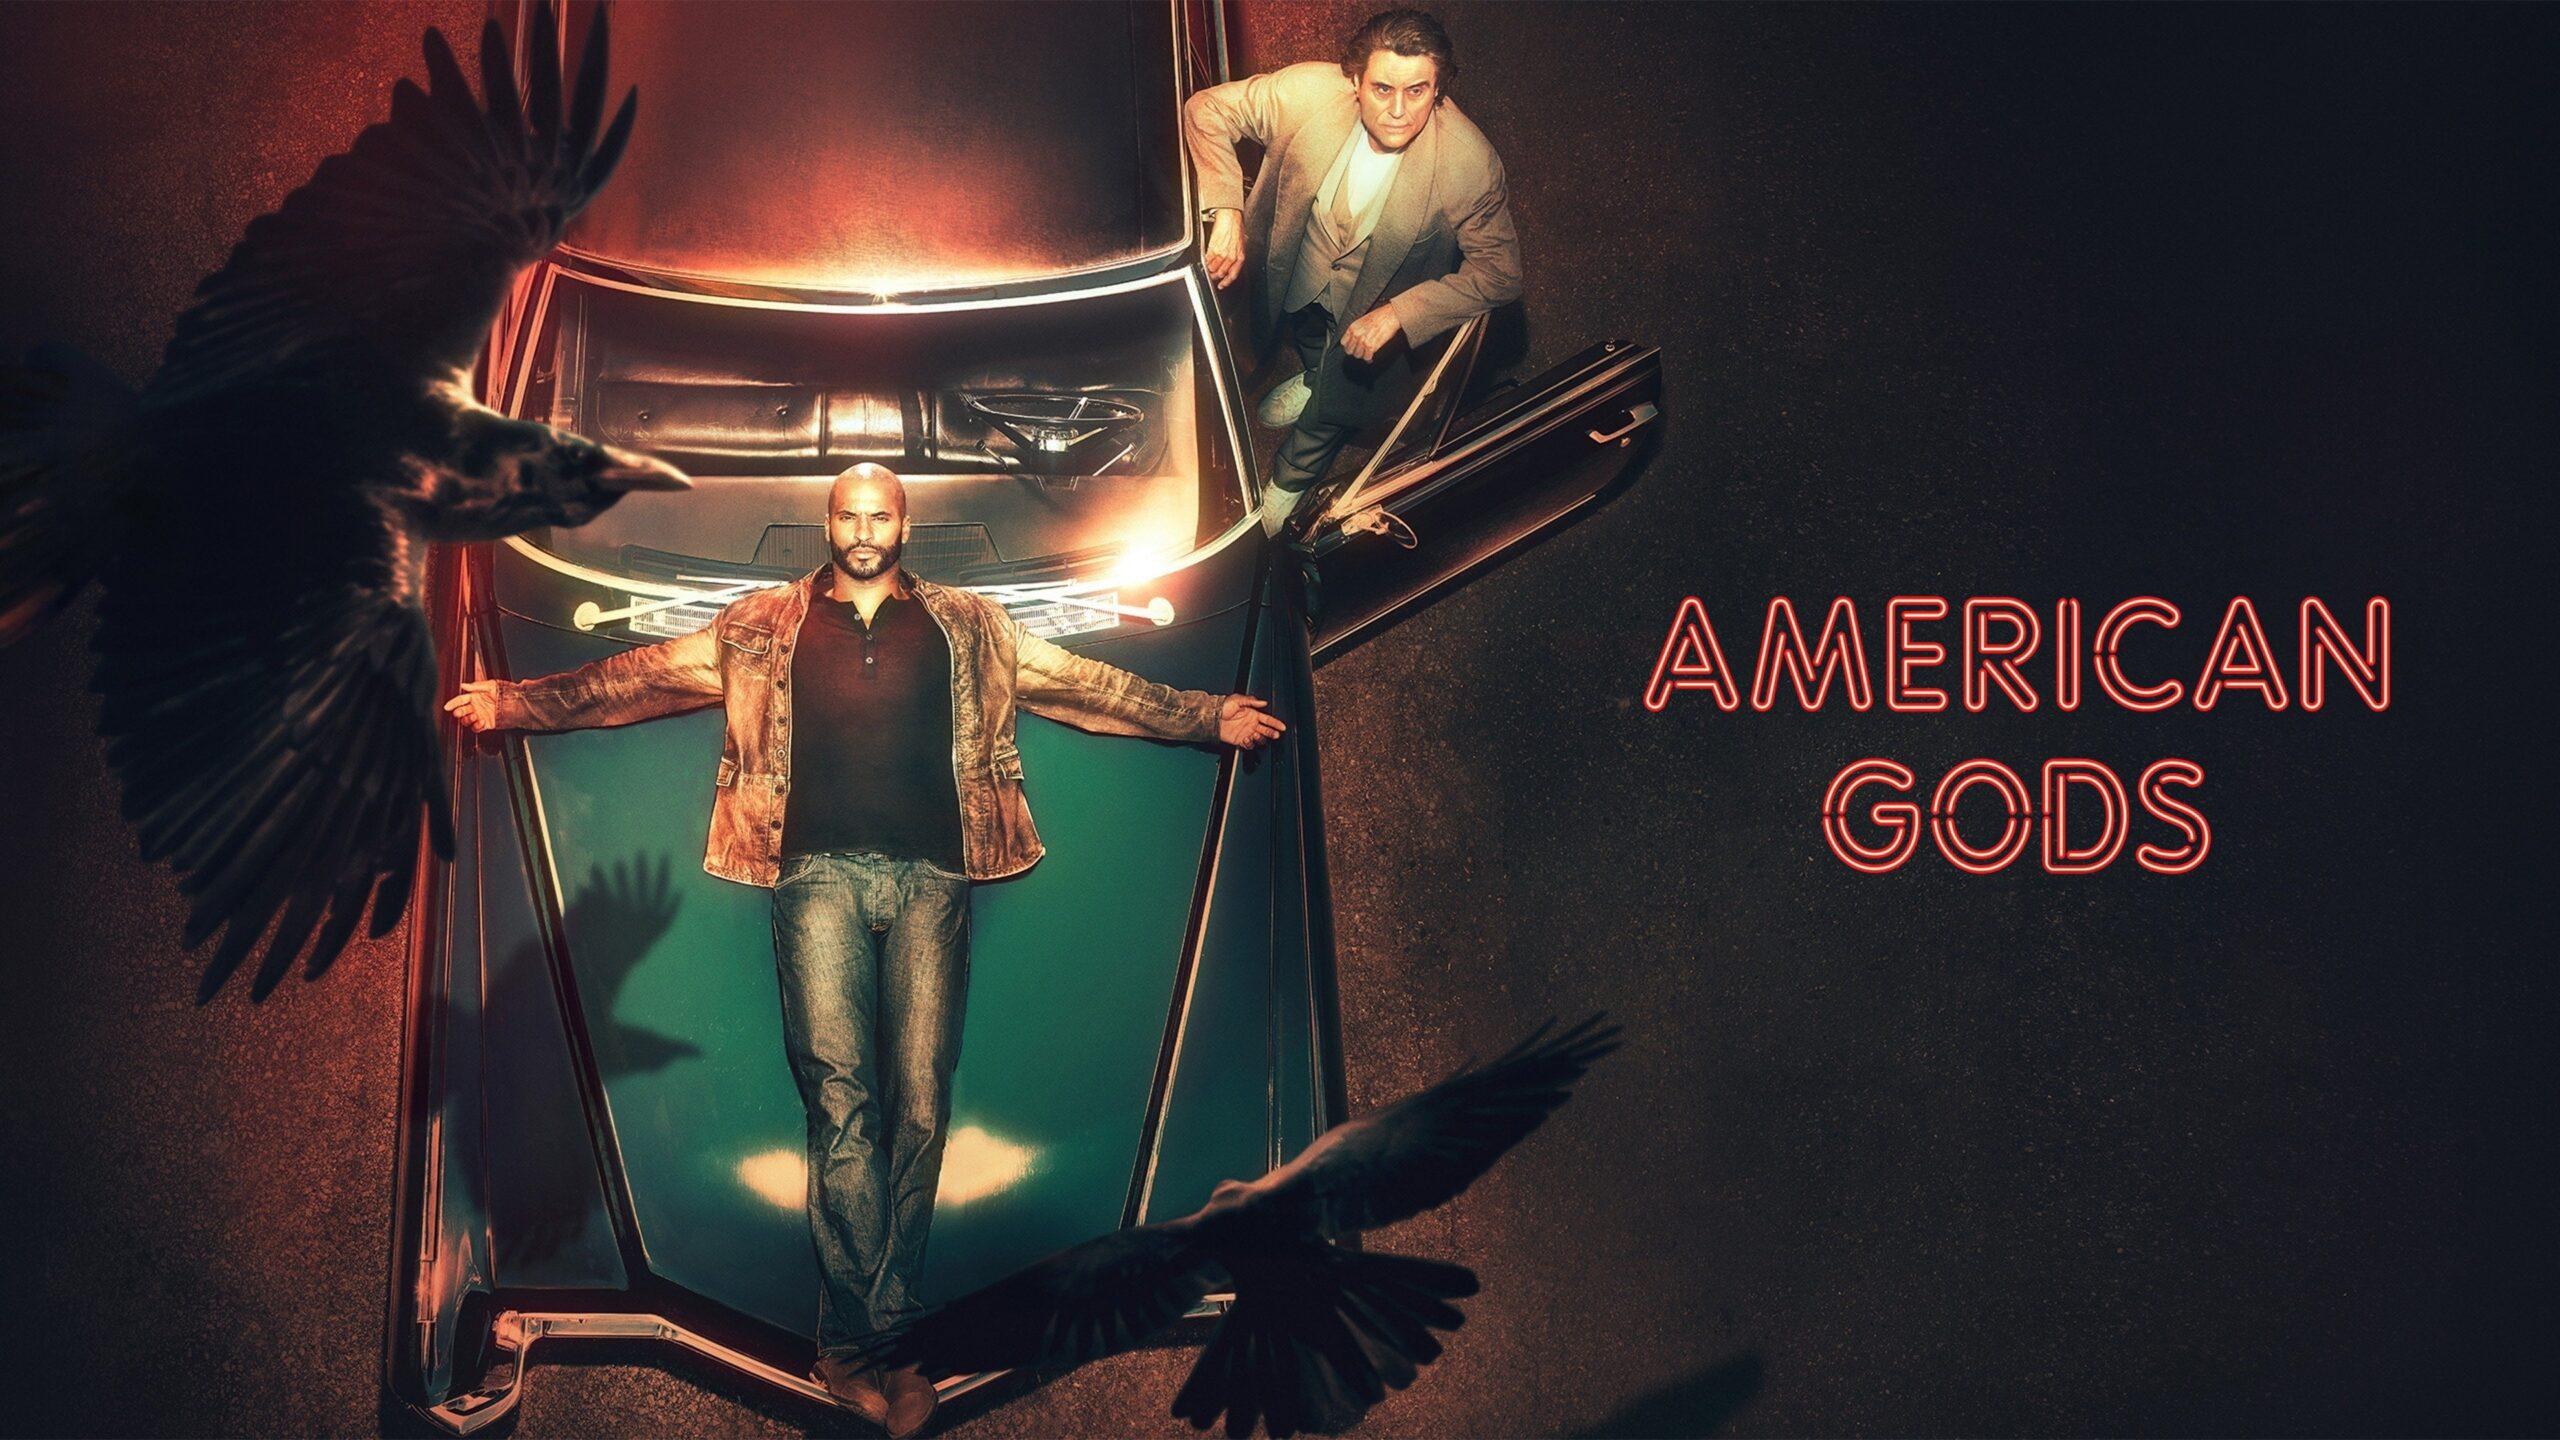 720p~ American Gods Season 3 Episode 5